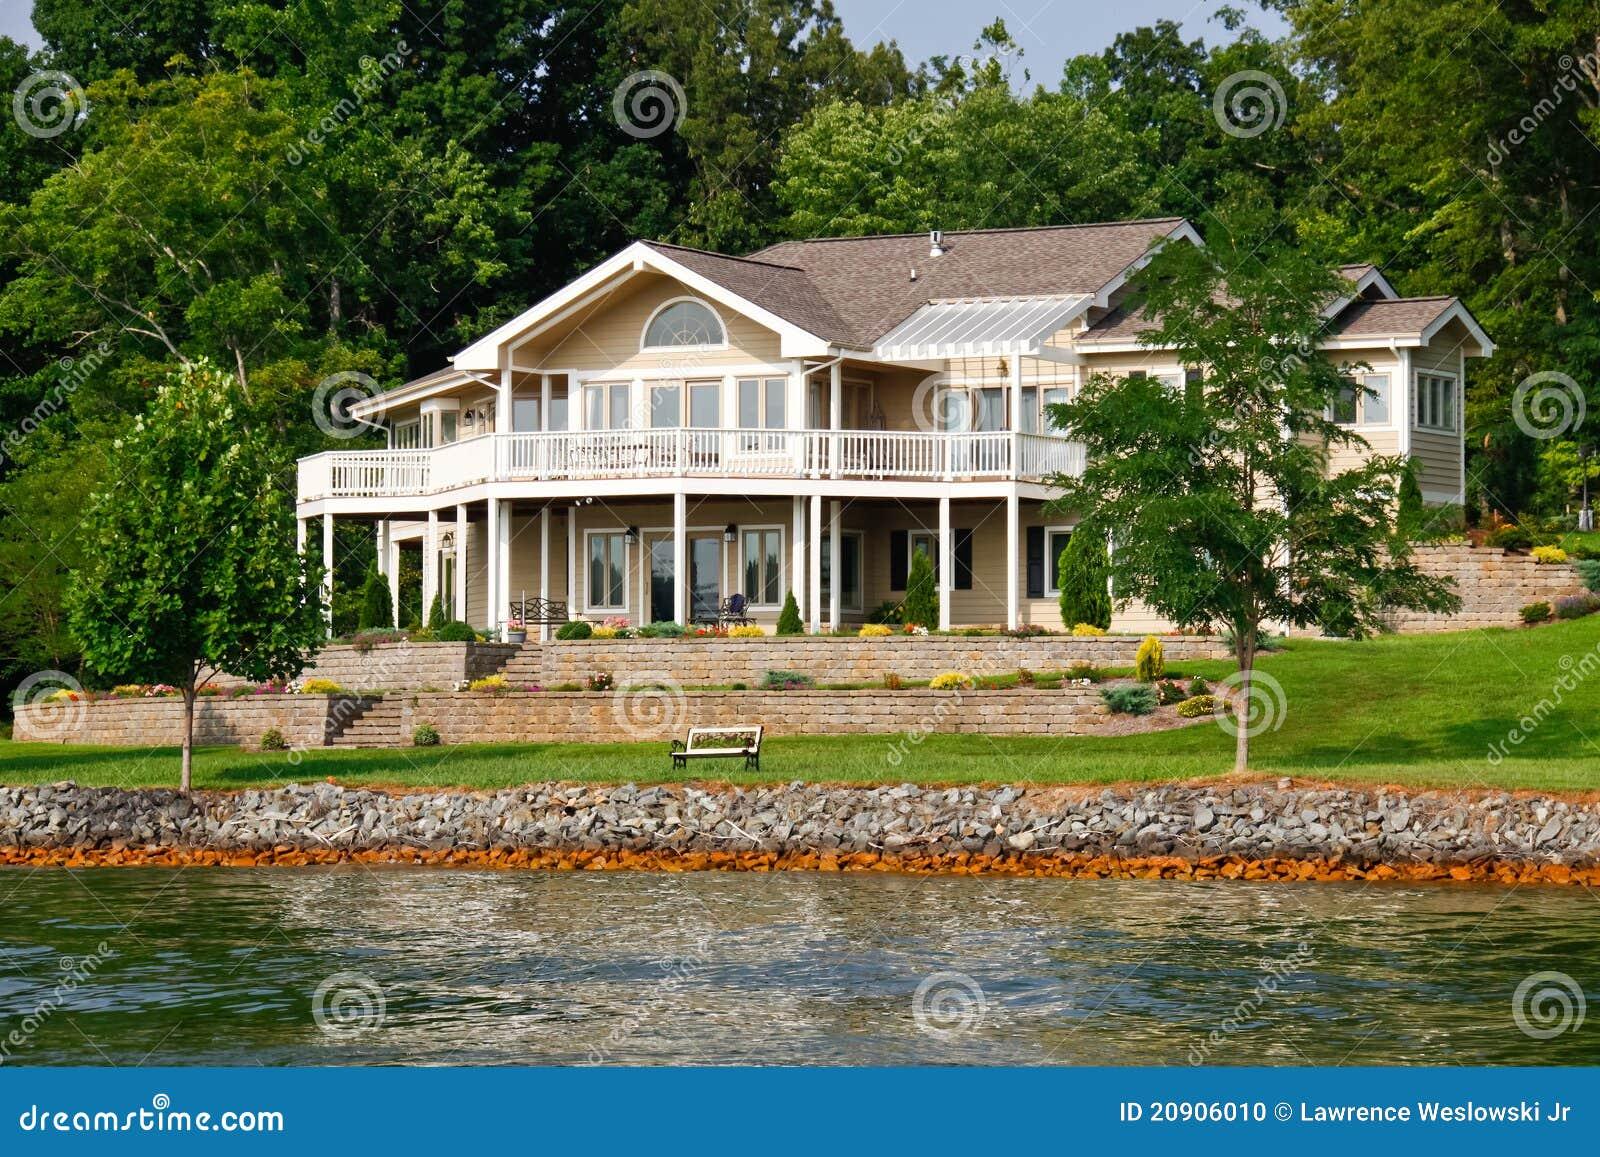 belle maison de bord de mer lac mountain de smith photo. Black Bedroom Furniture Sets. Home Design Ideas